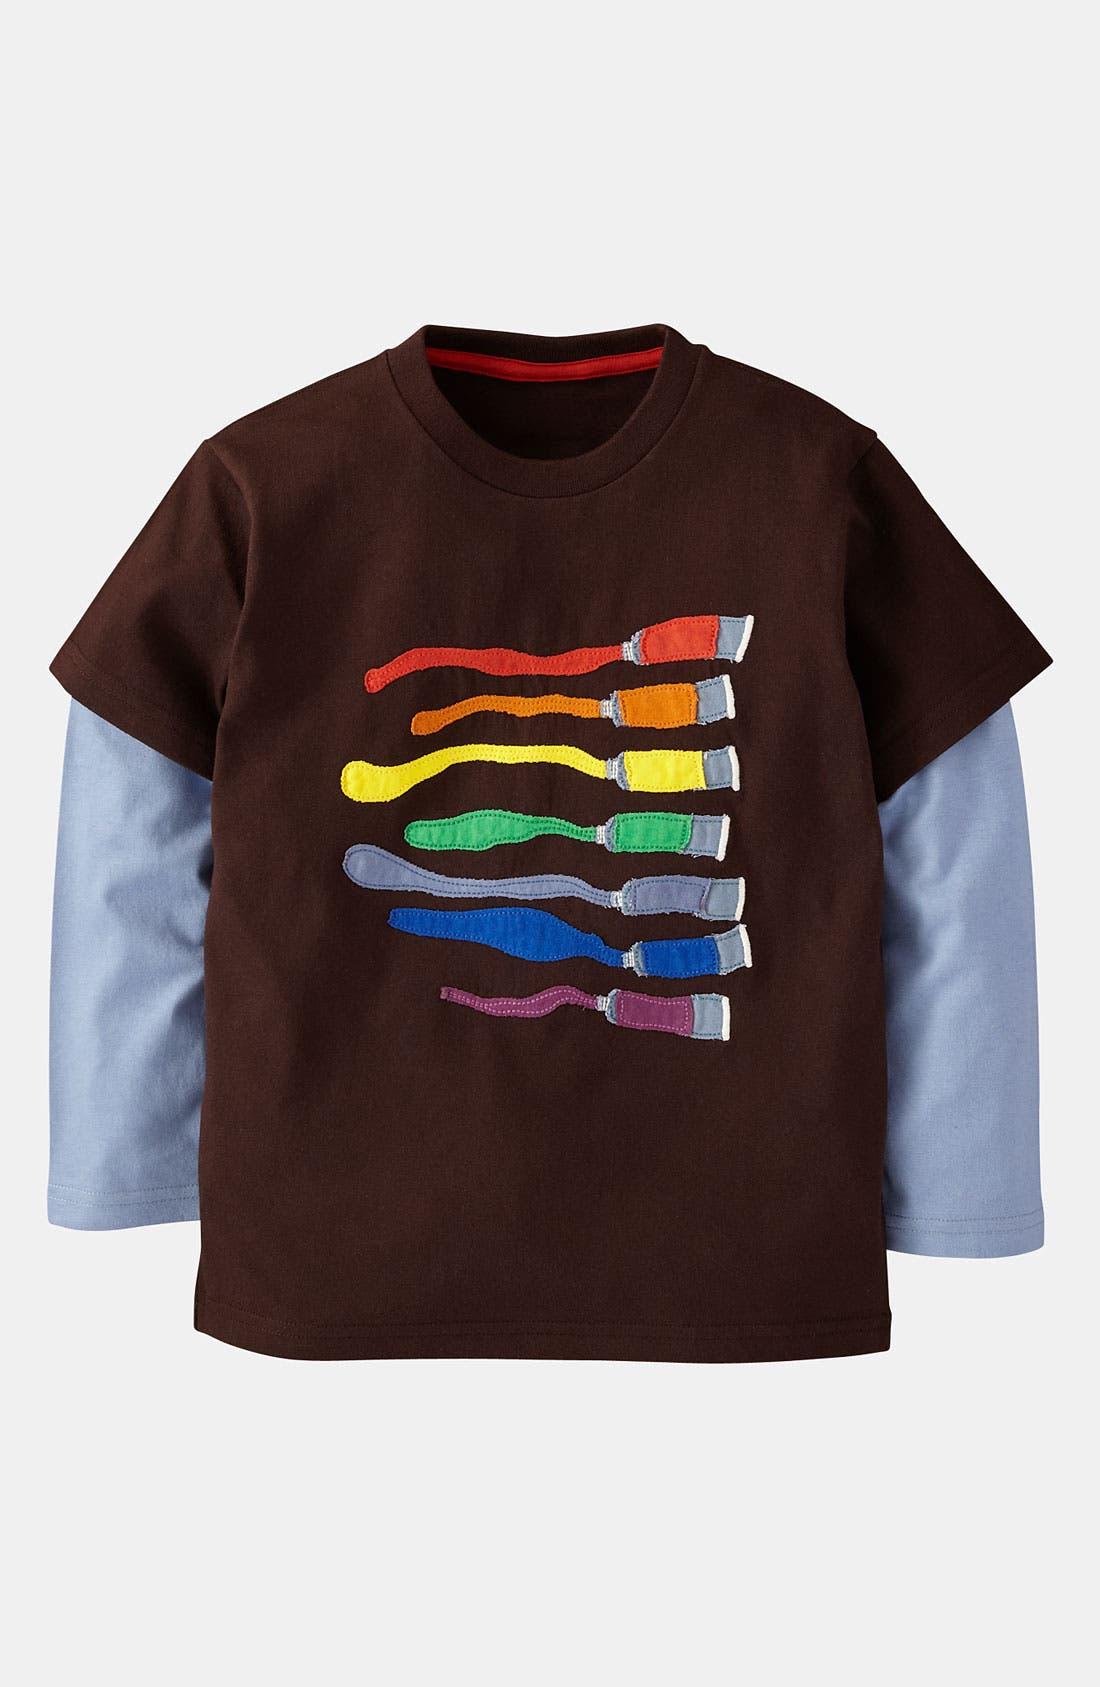 Alternate Image 1 Selected - Mini Boden 'Colorblast' T-Shirt (Toddler)